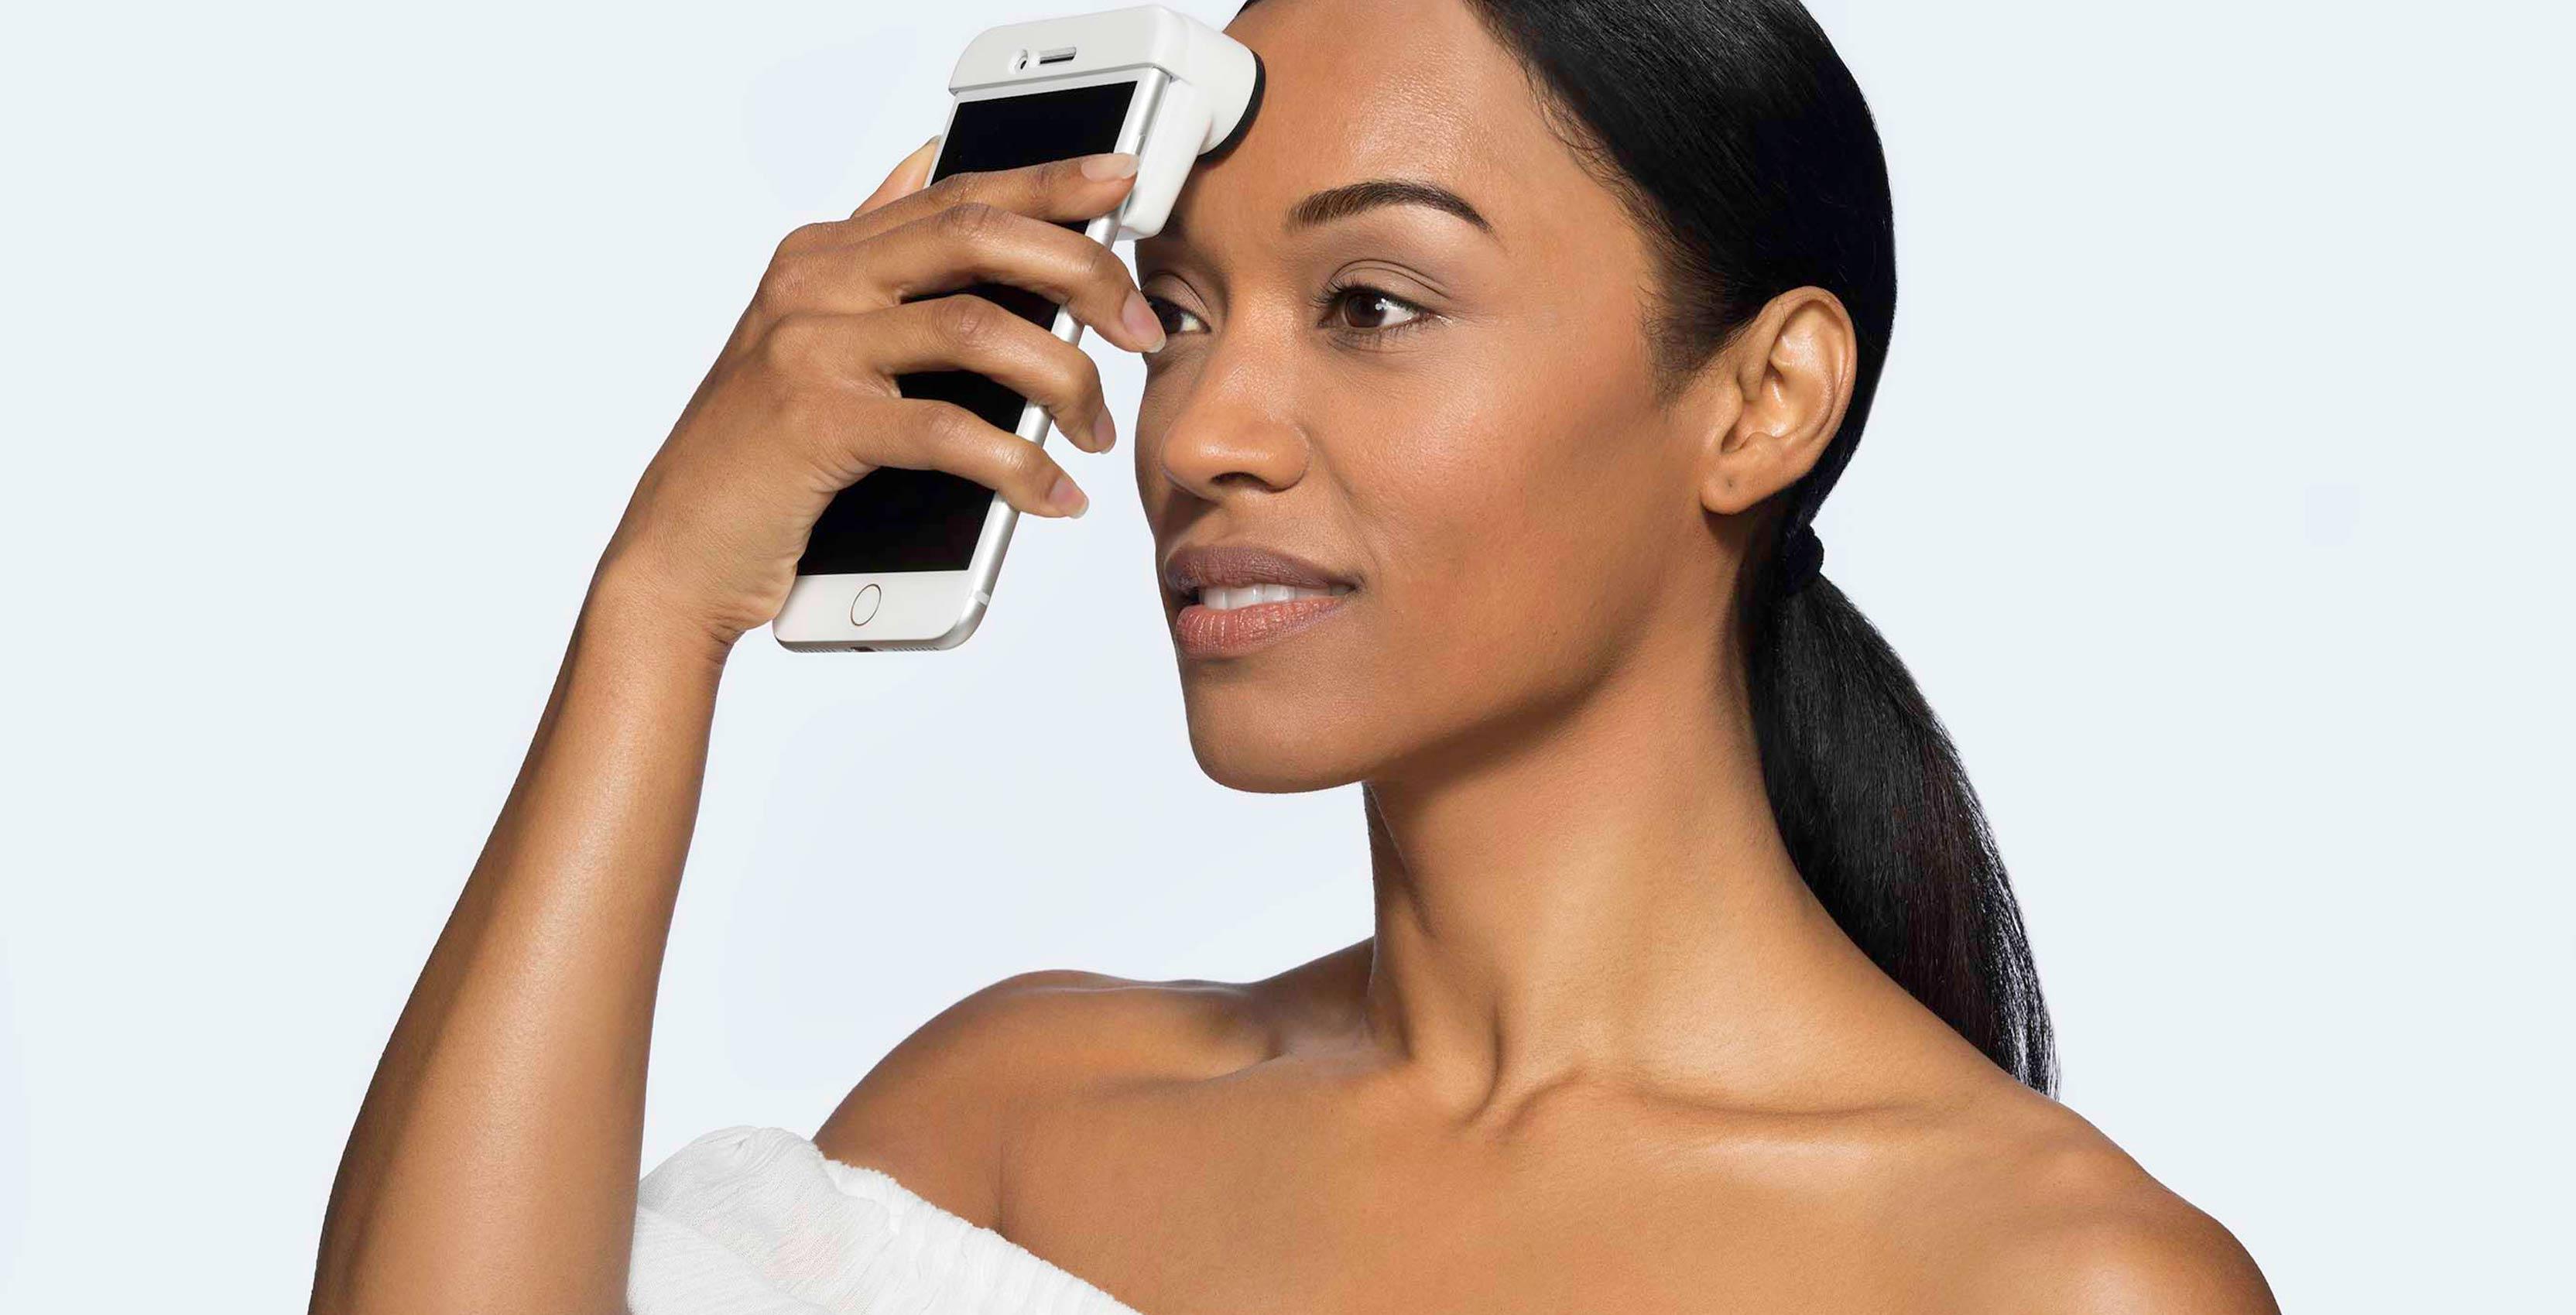 Neutrogena's SkinScanner tool